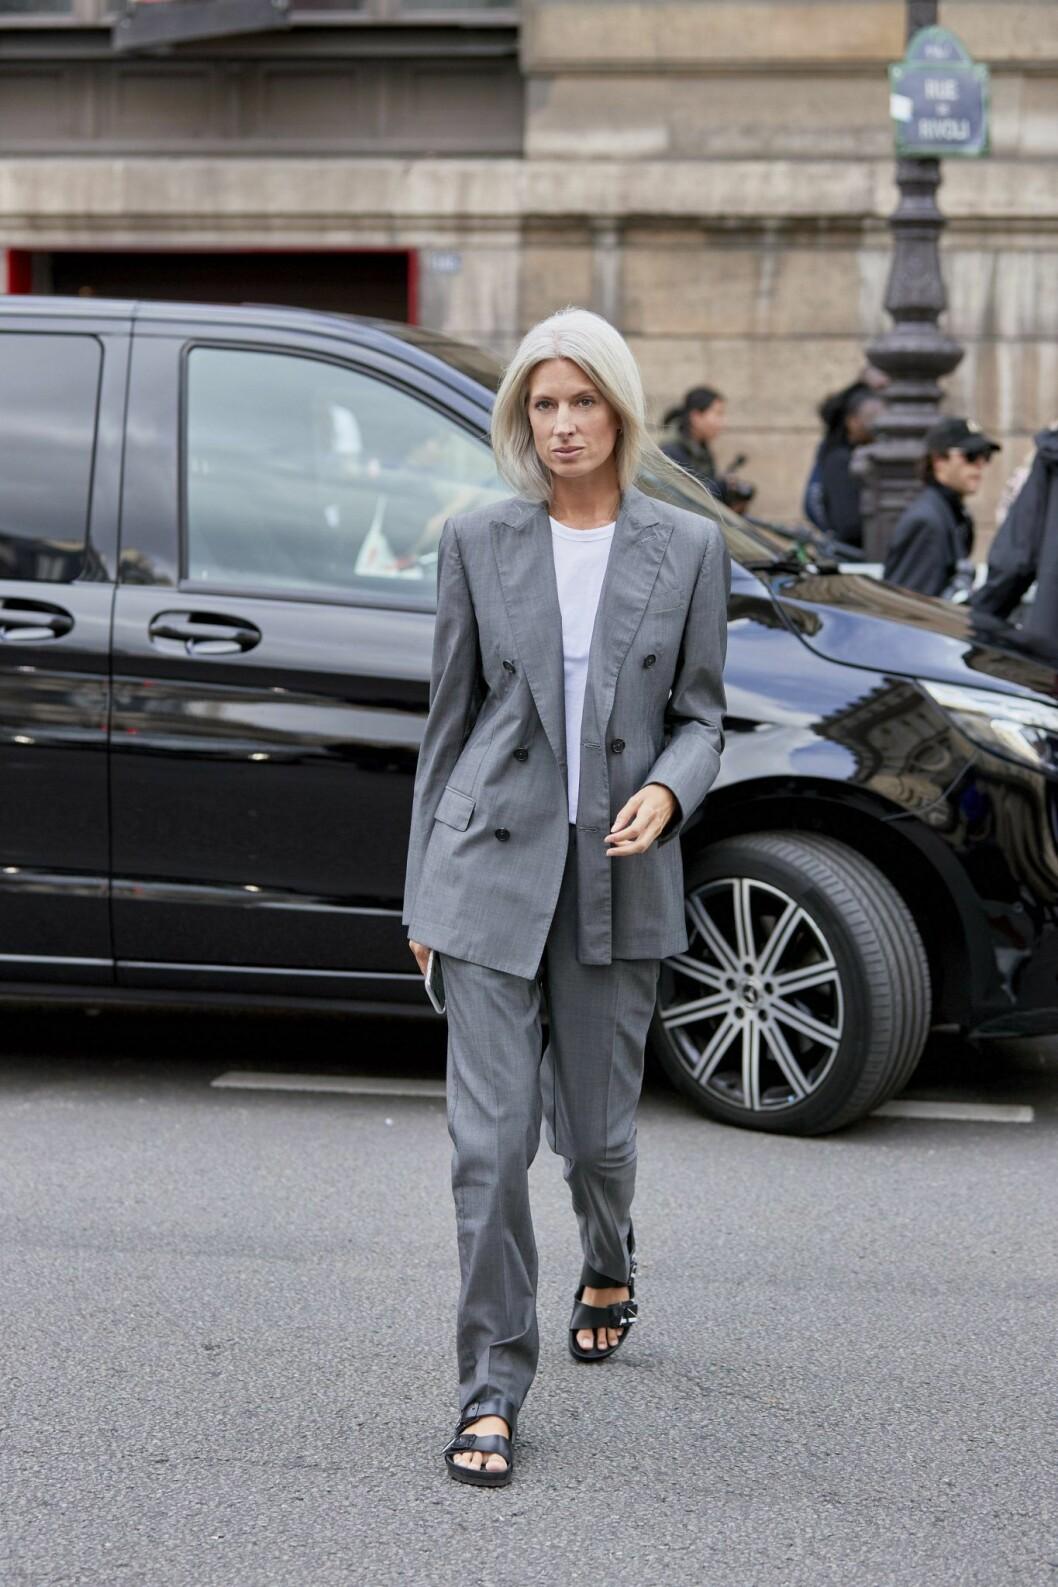 streetstyle från Paris modevecka.